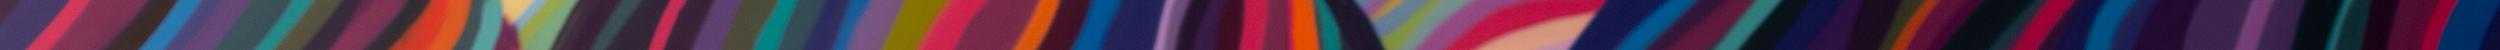 50pt_horizontalrainbowbar_option2.png